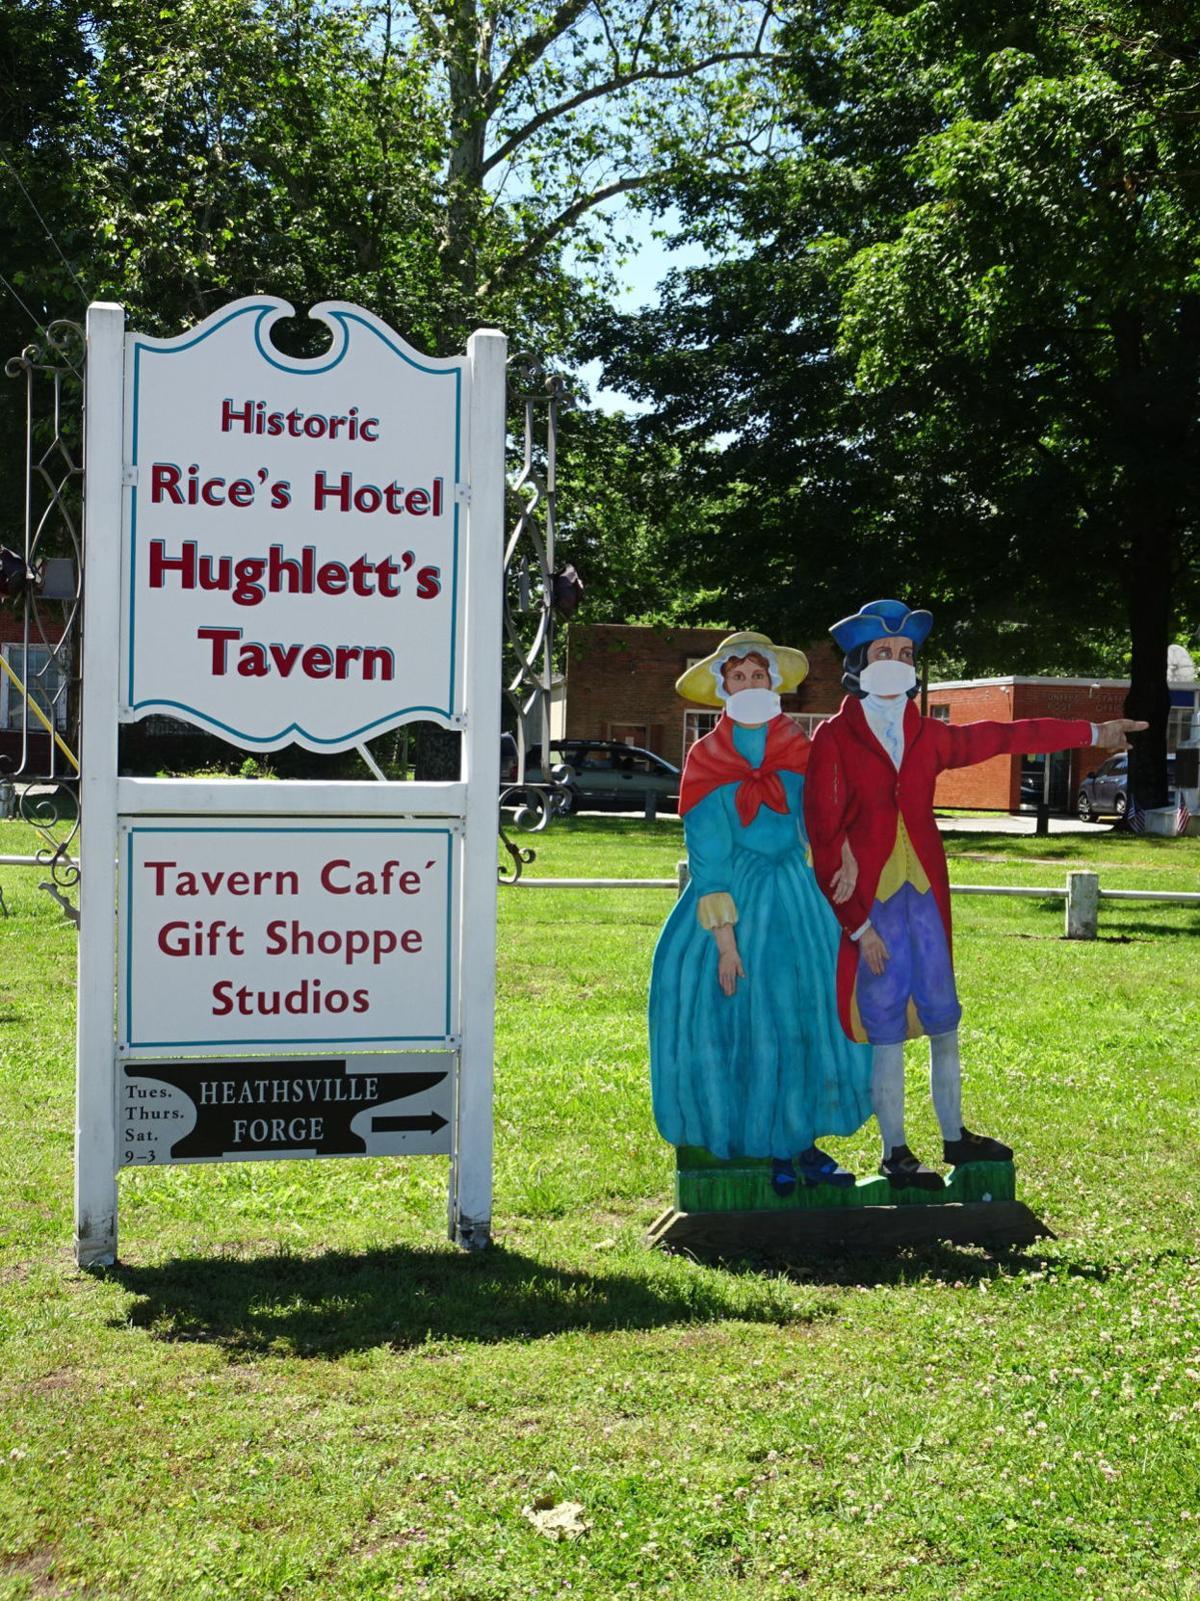 Hughlett's Tavern